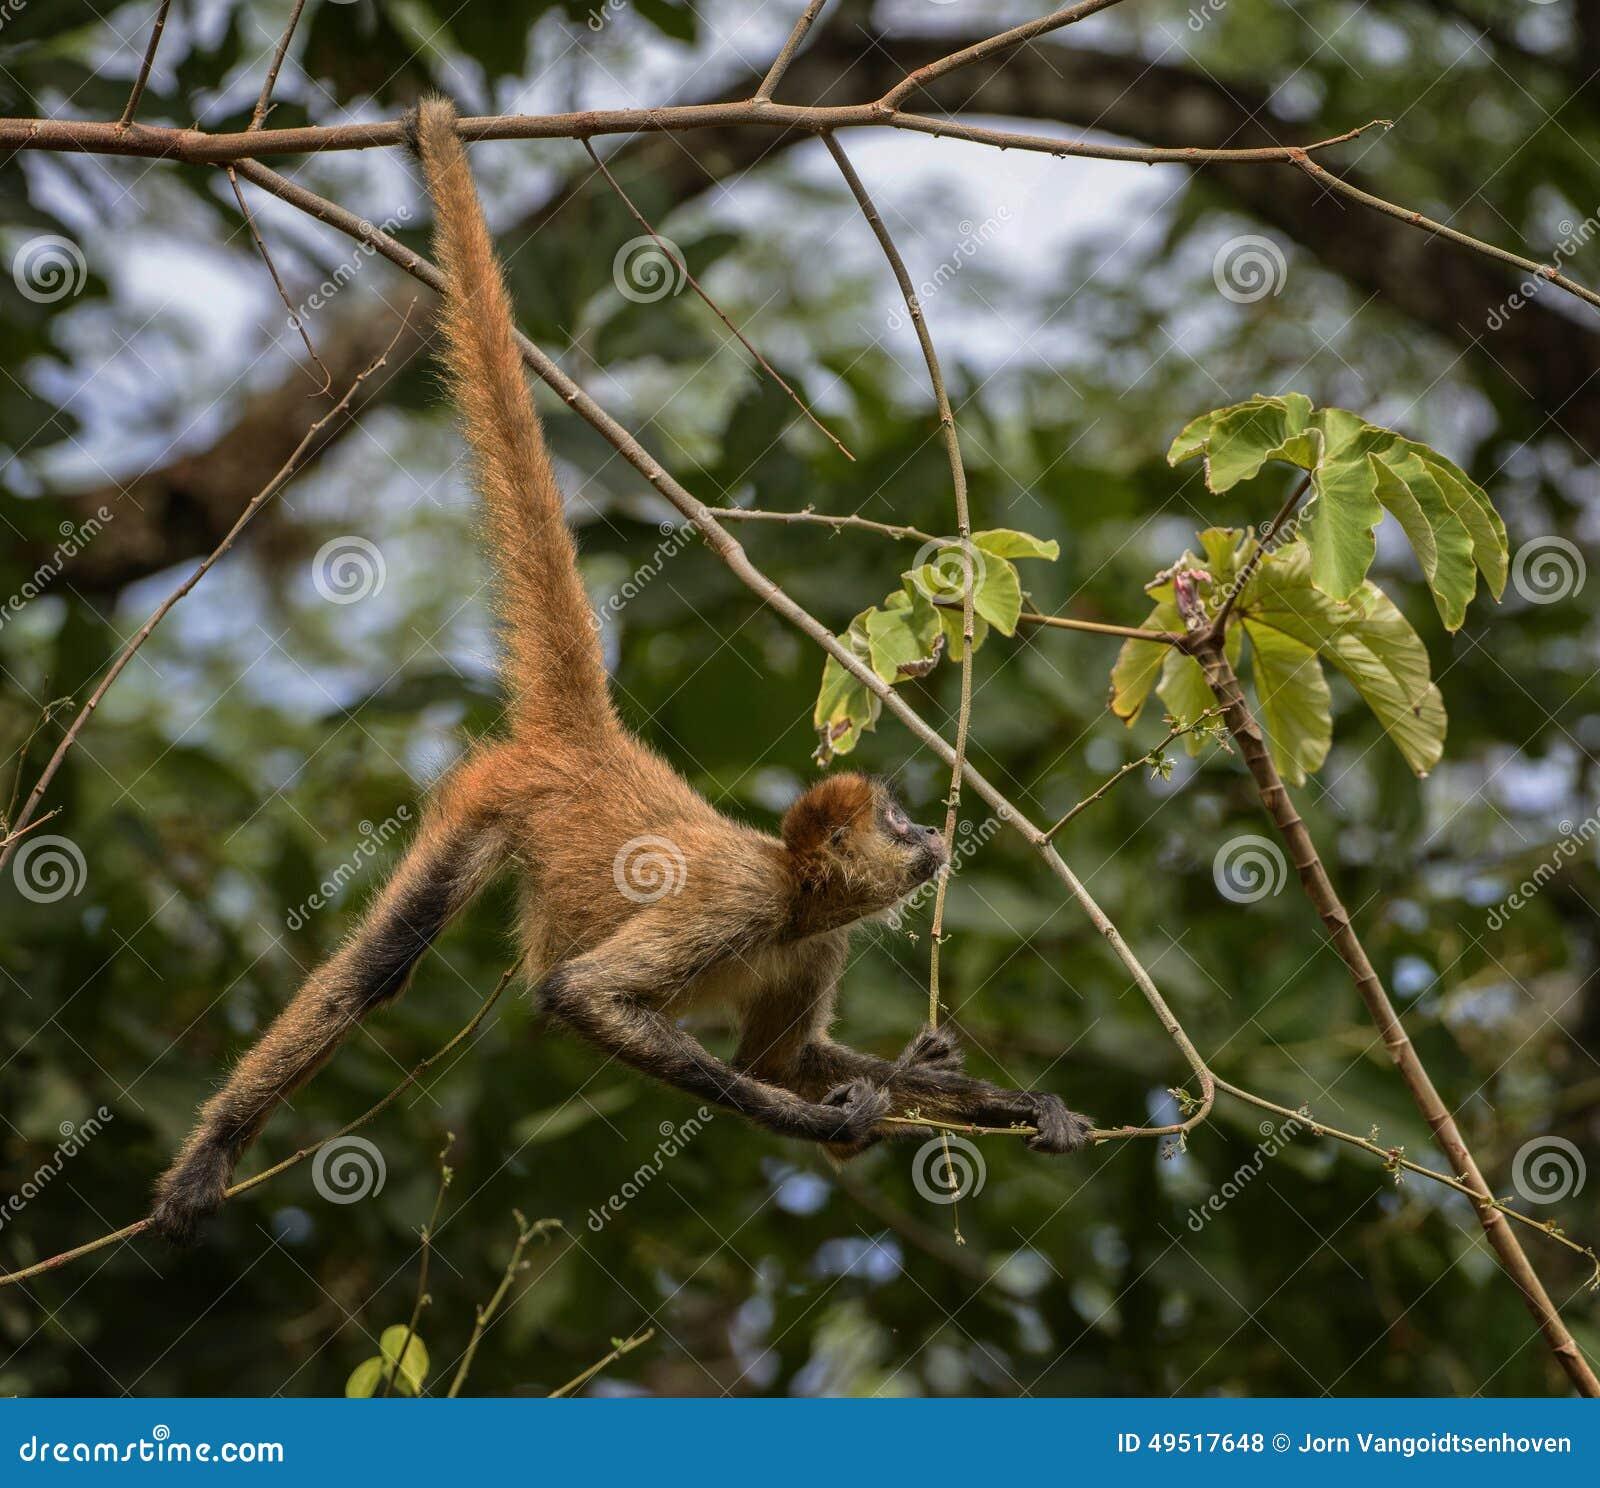 Macaco de aranha curioso